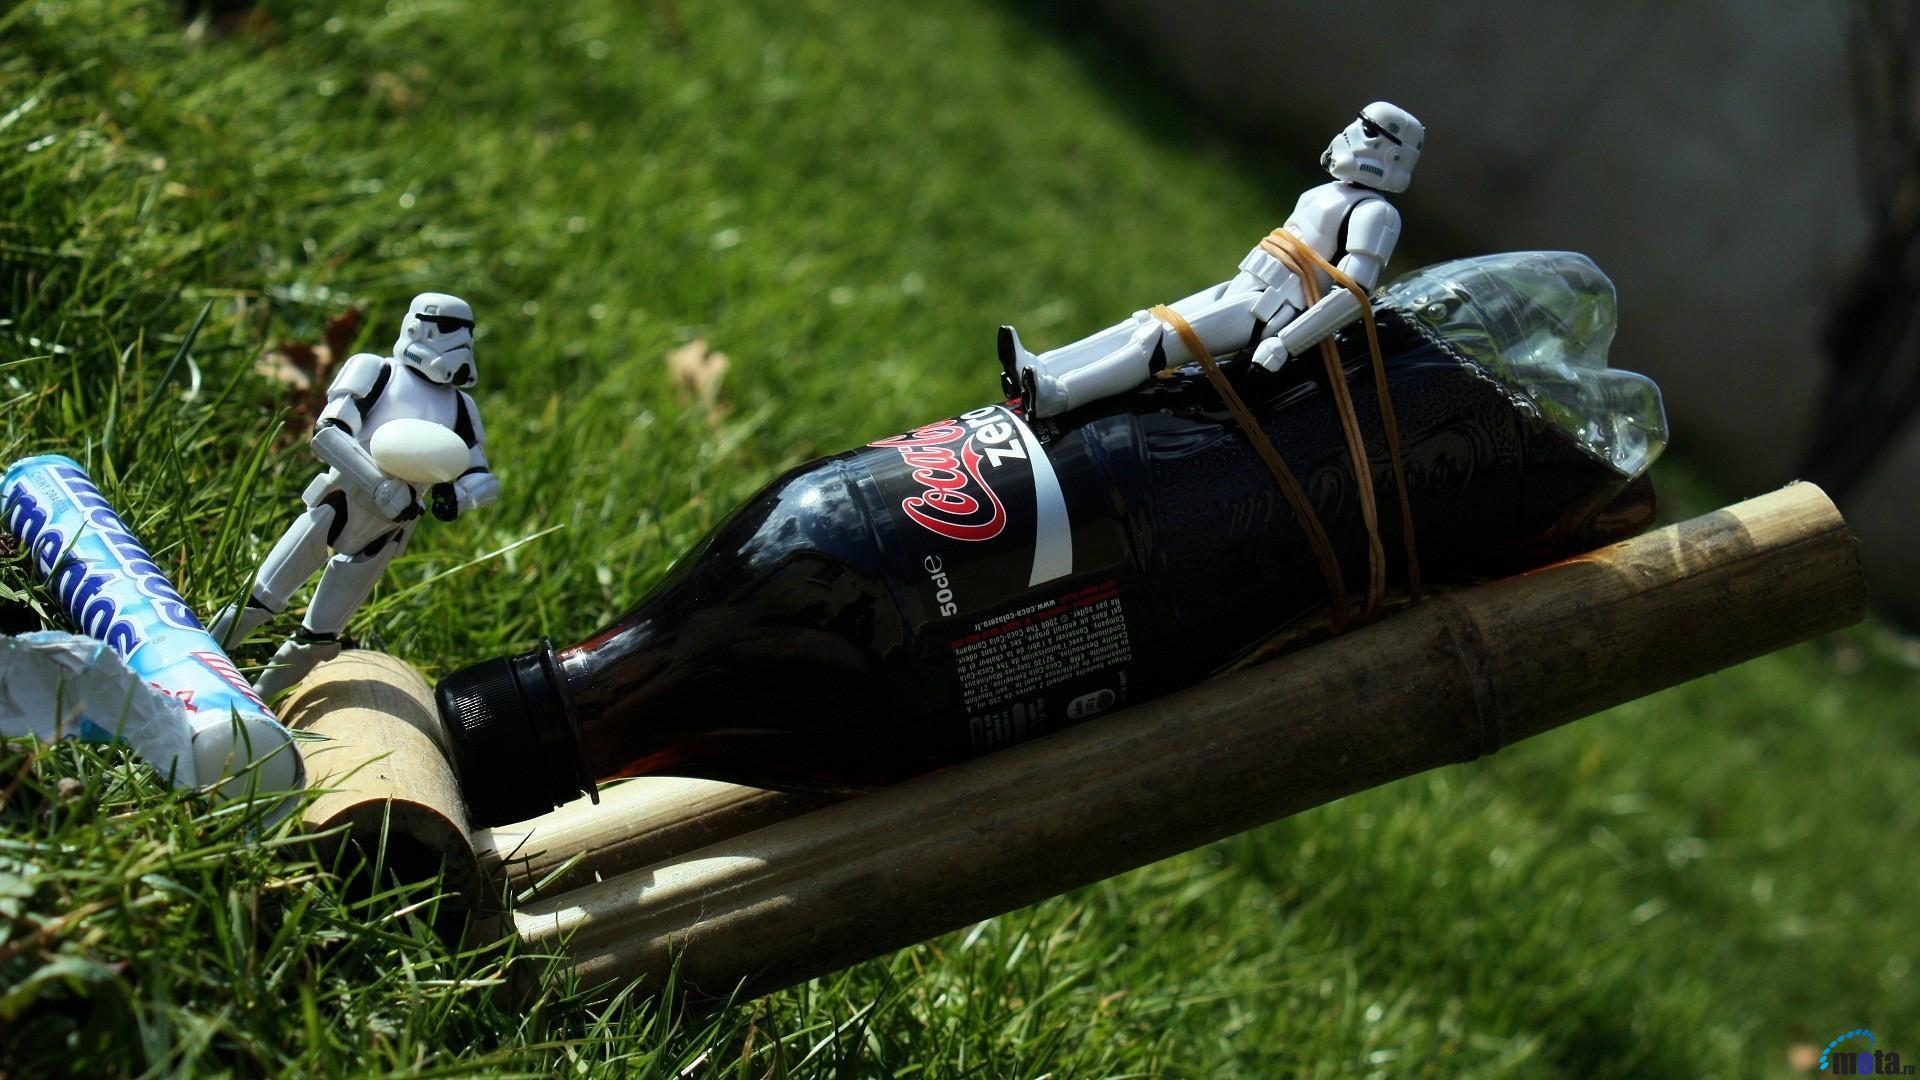 Download wallpaper Stormtroopers Coca Cola and Mentos 1920x1080